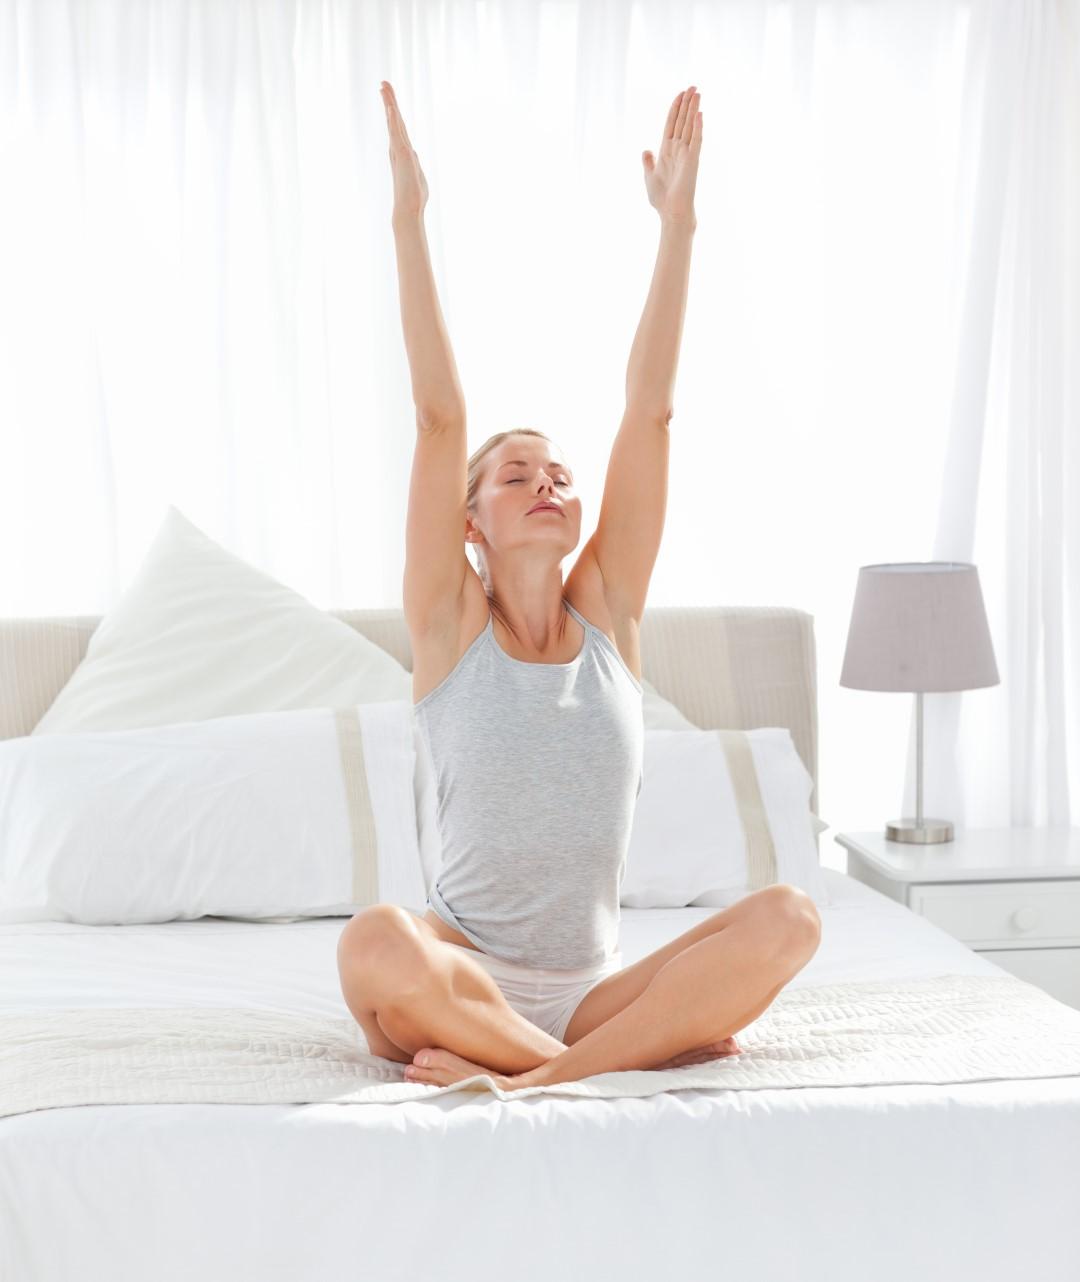 BEDD_Sleep Smarts_Meditation_Bed (Large)